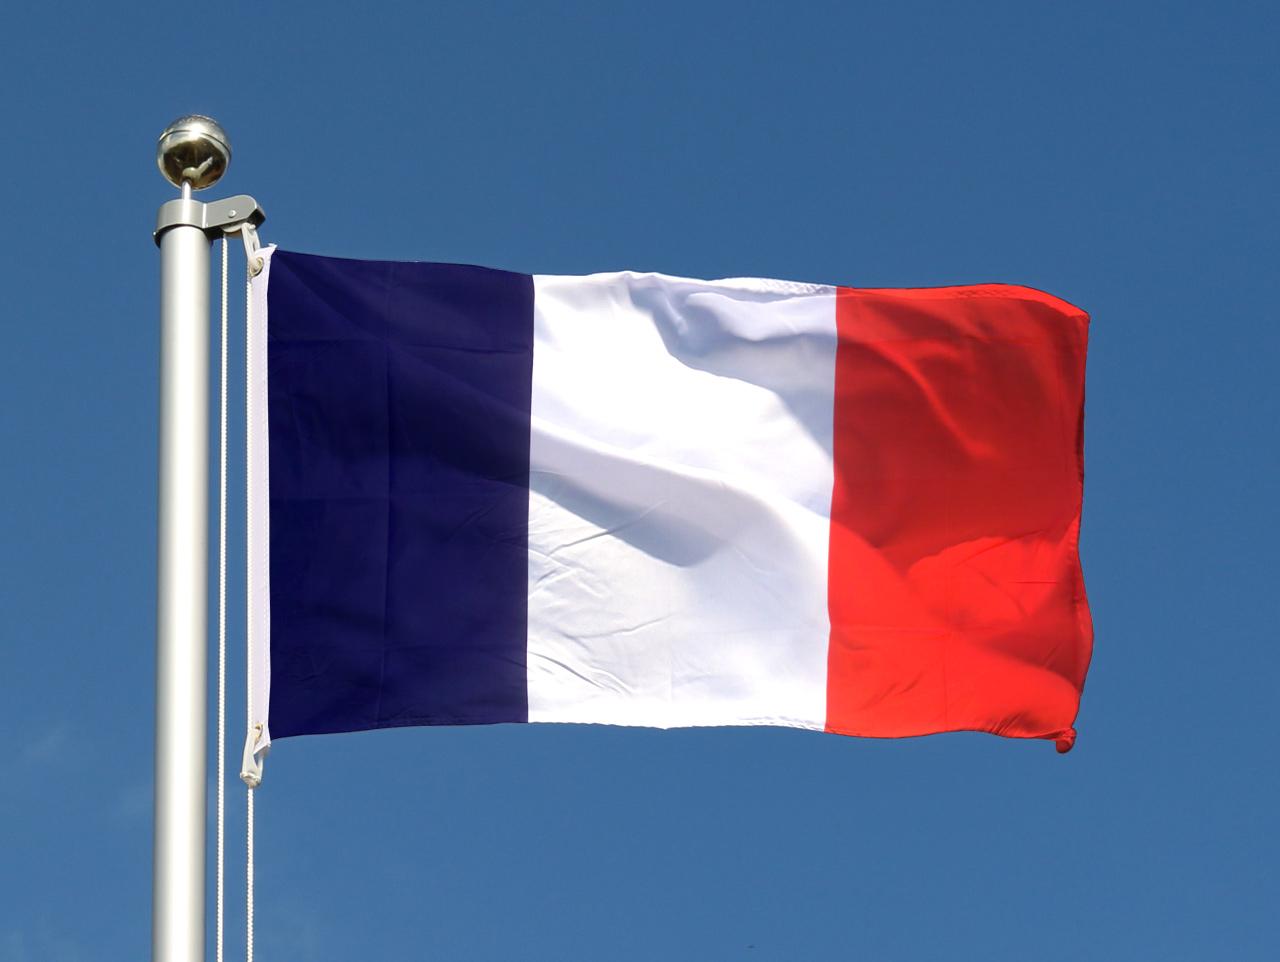 drapeau fran u00e7ais pas cher - 60 x 90 cm